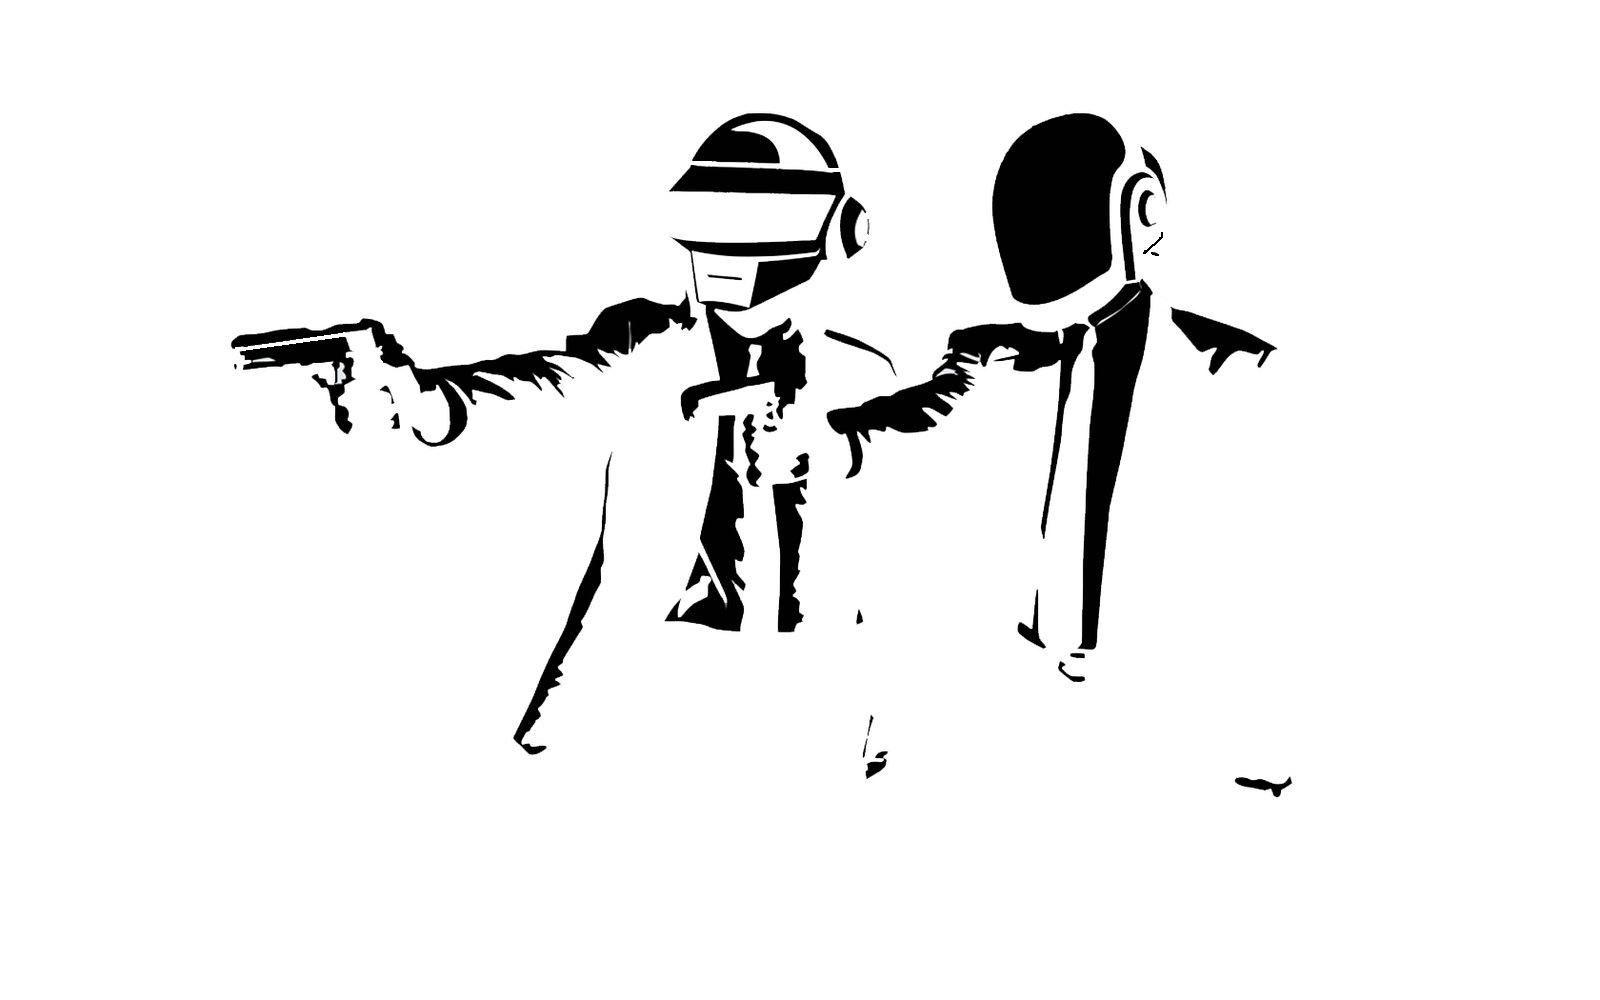 Futuristic Men With Guns Stencils